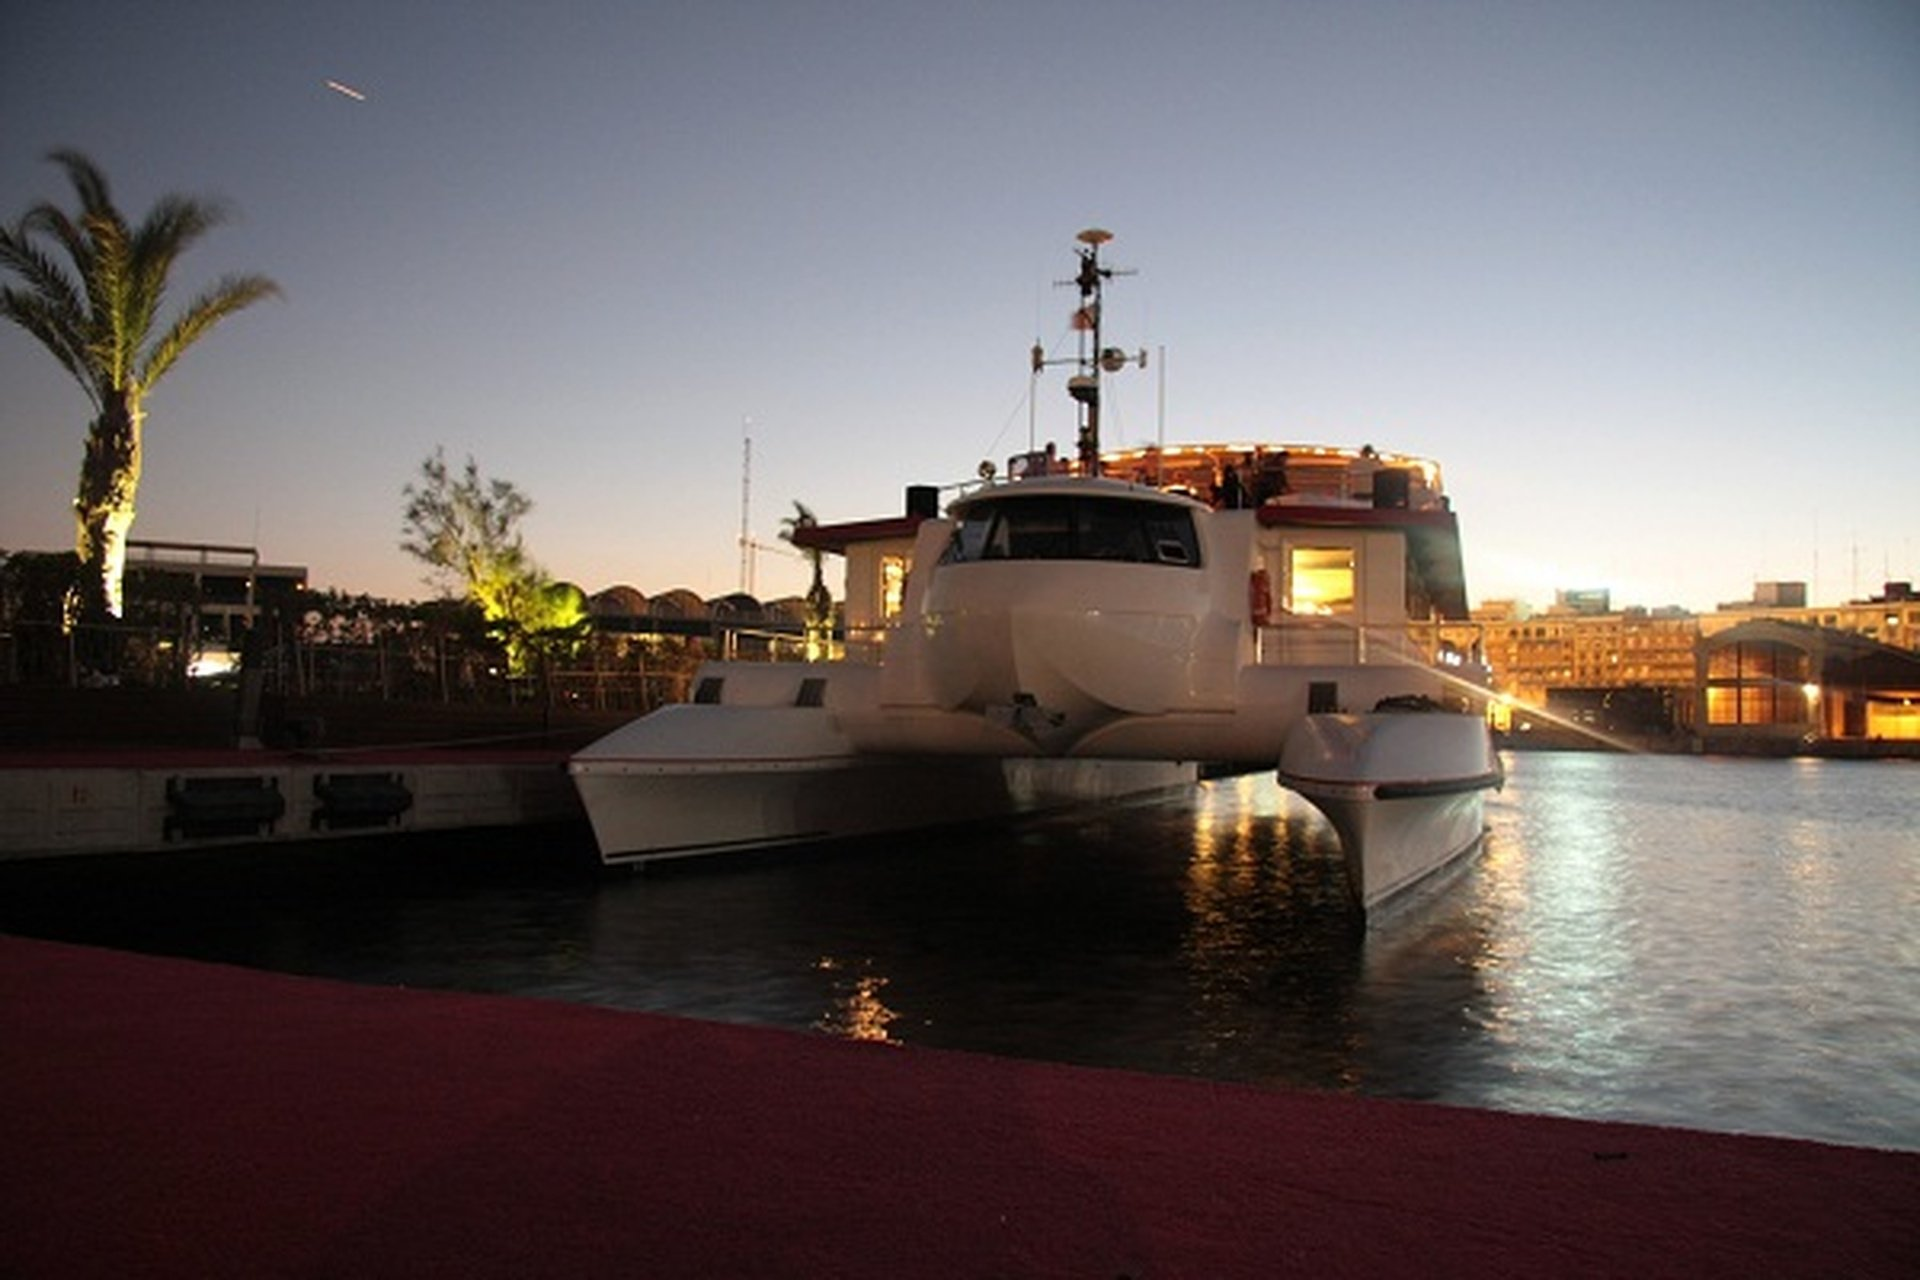 Rest der Welt corporate event venues Boot Dama de Valencia image 0